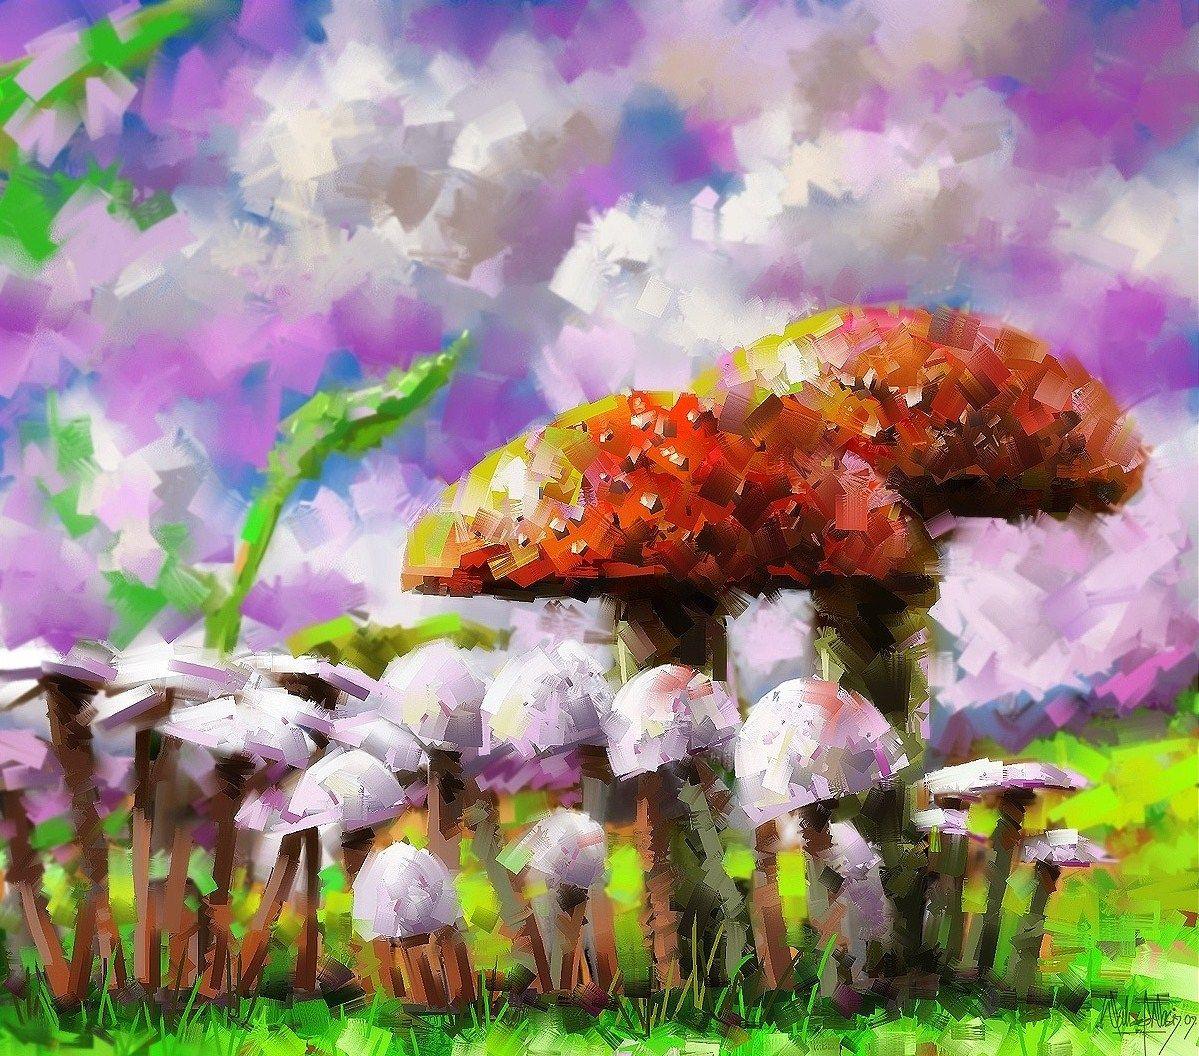 Animal Crossing New Horizons Flower Field